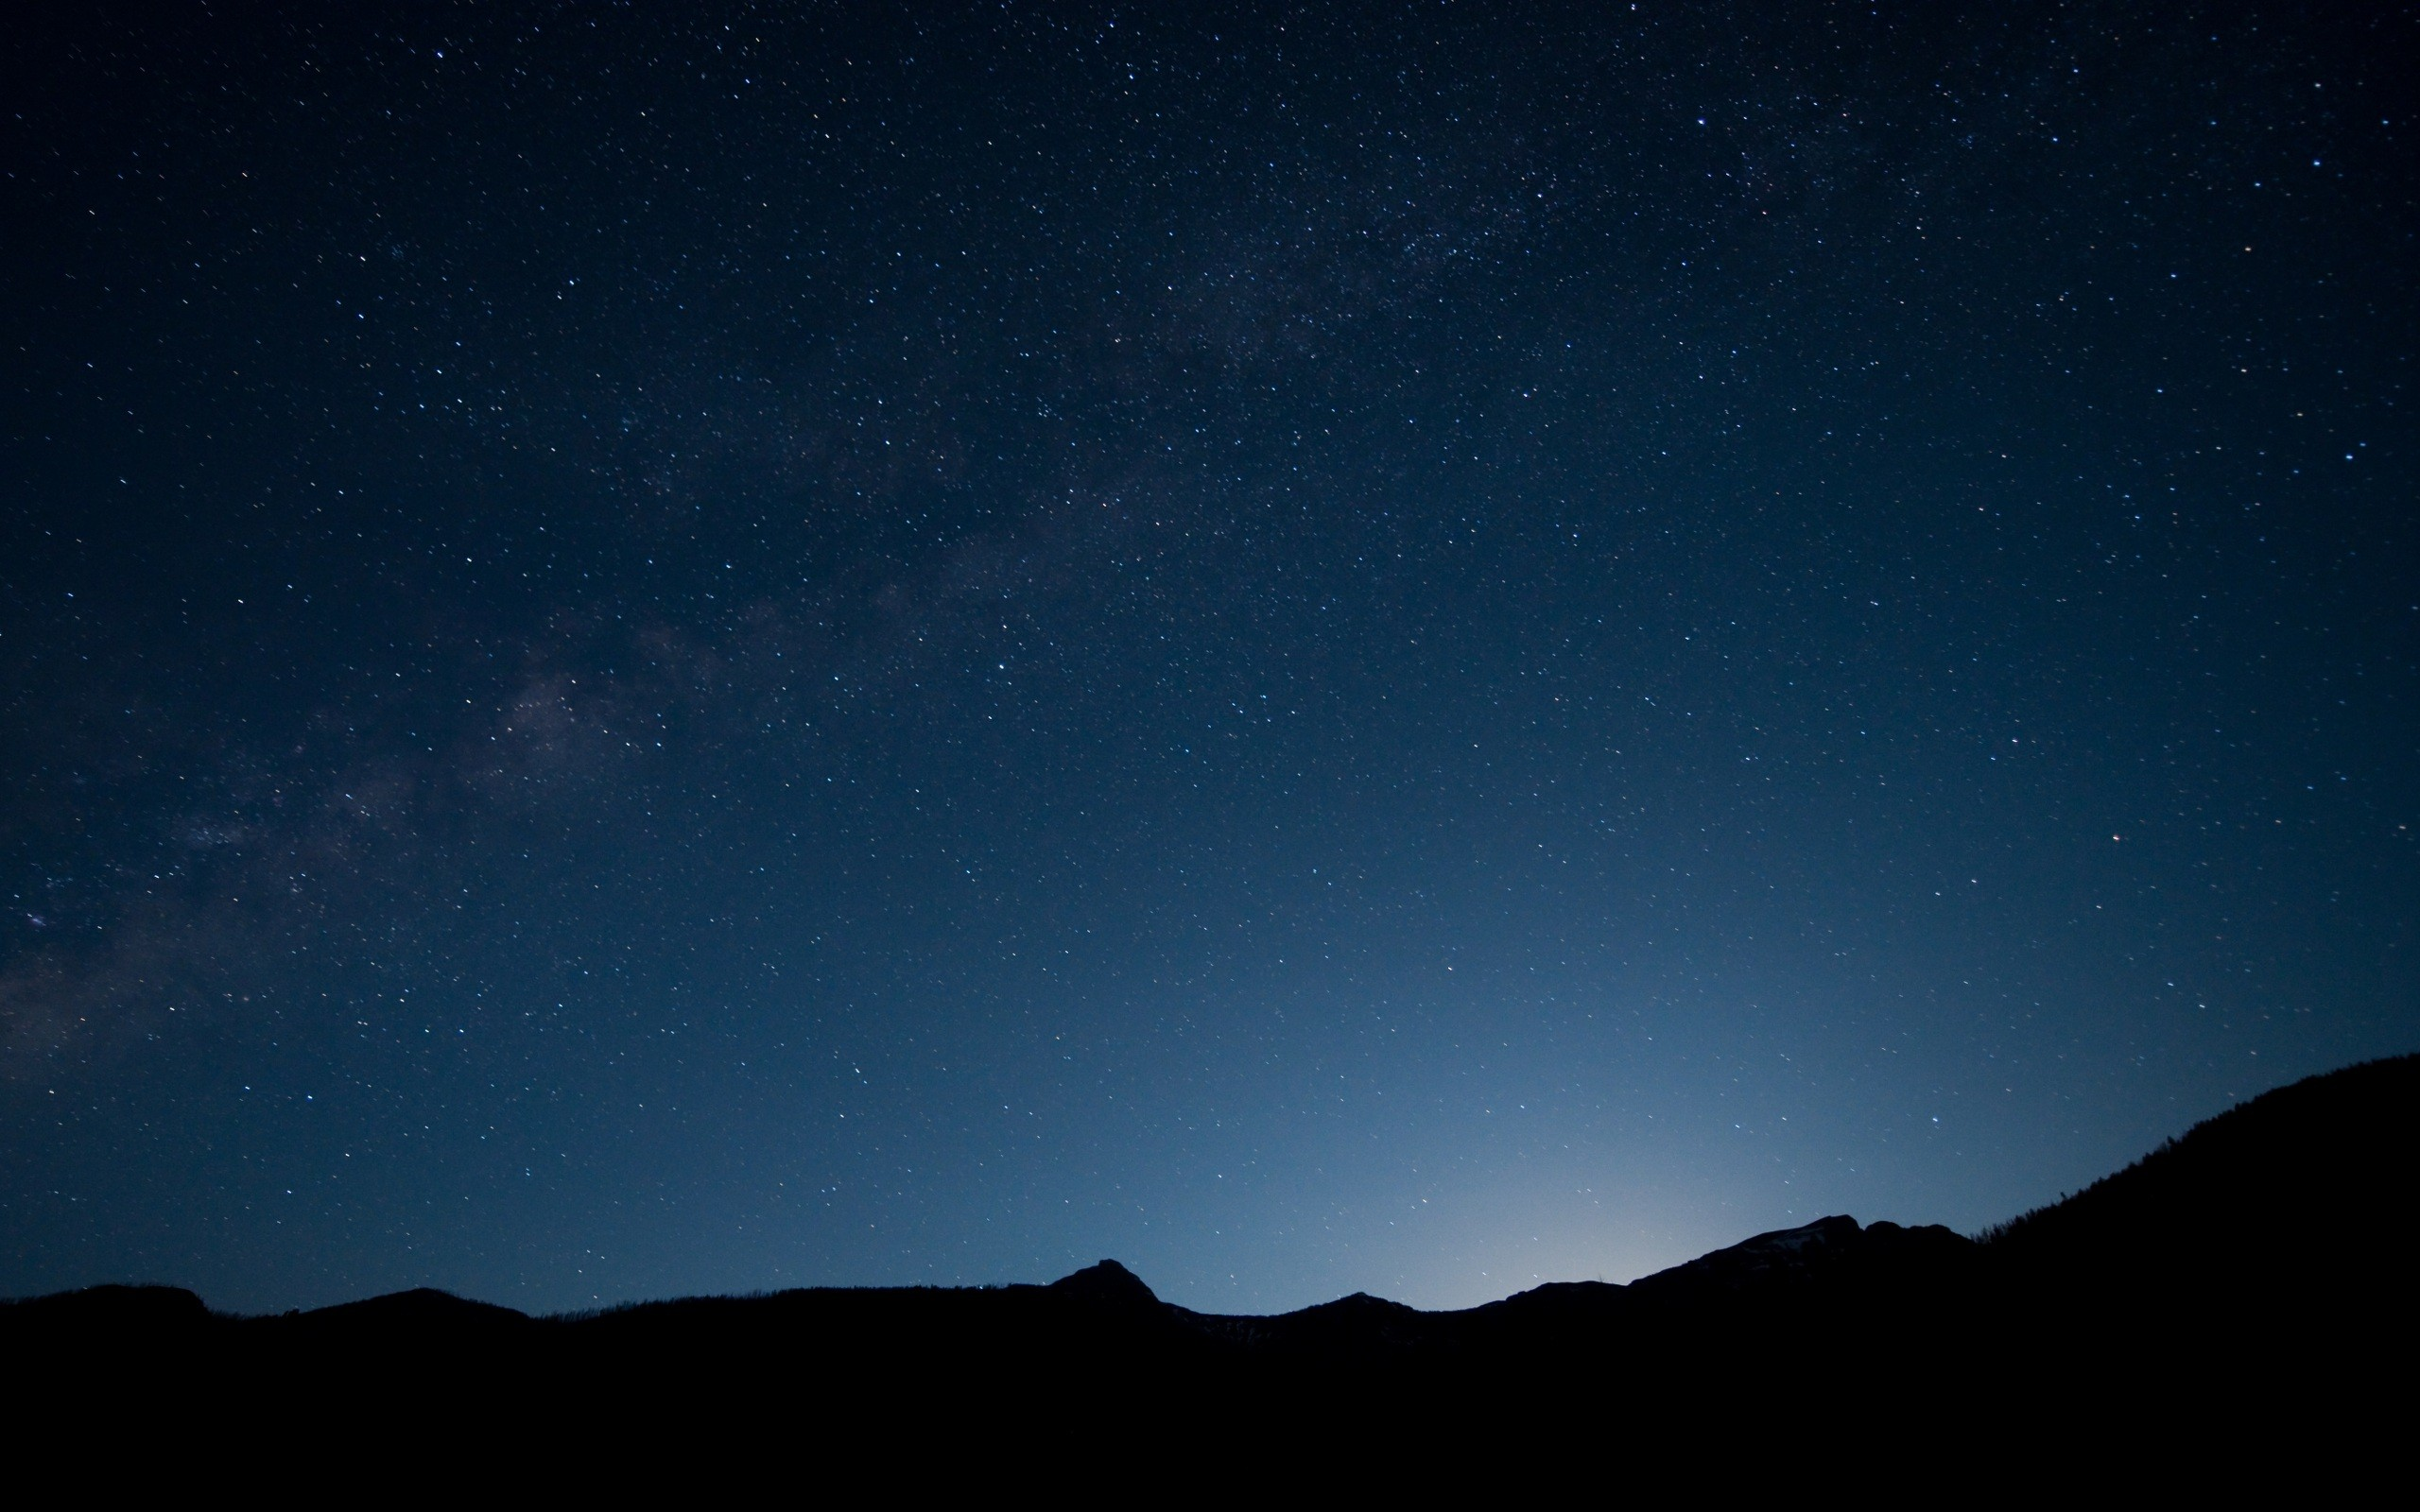 Beautiful Starry Night Sky Wallpaper 2560x1600